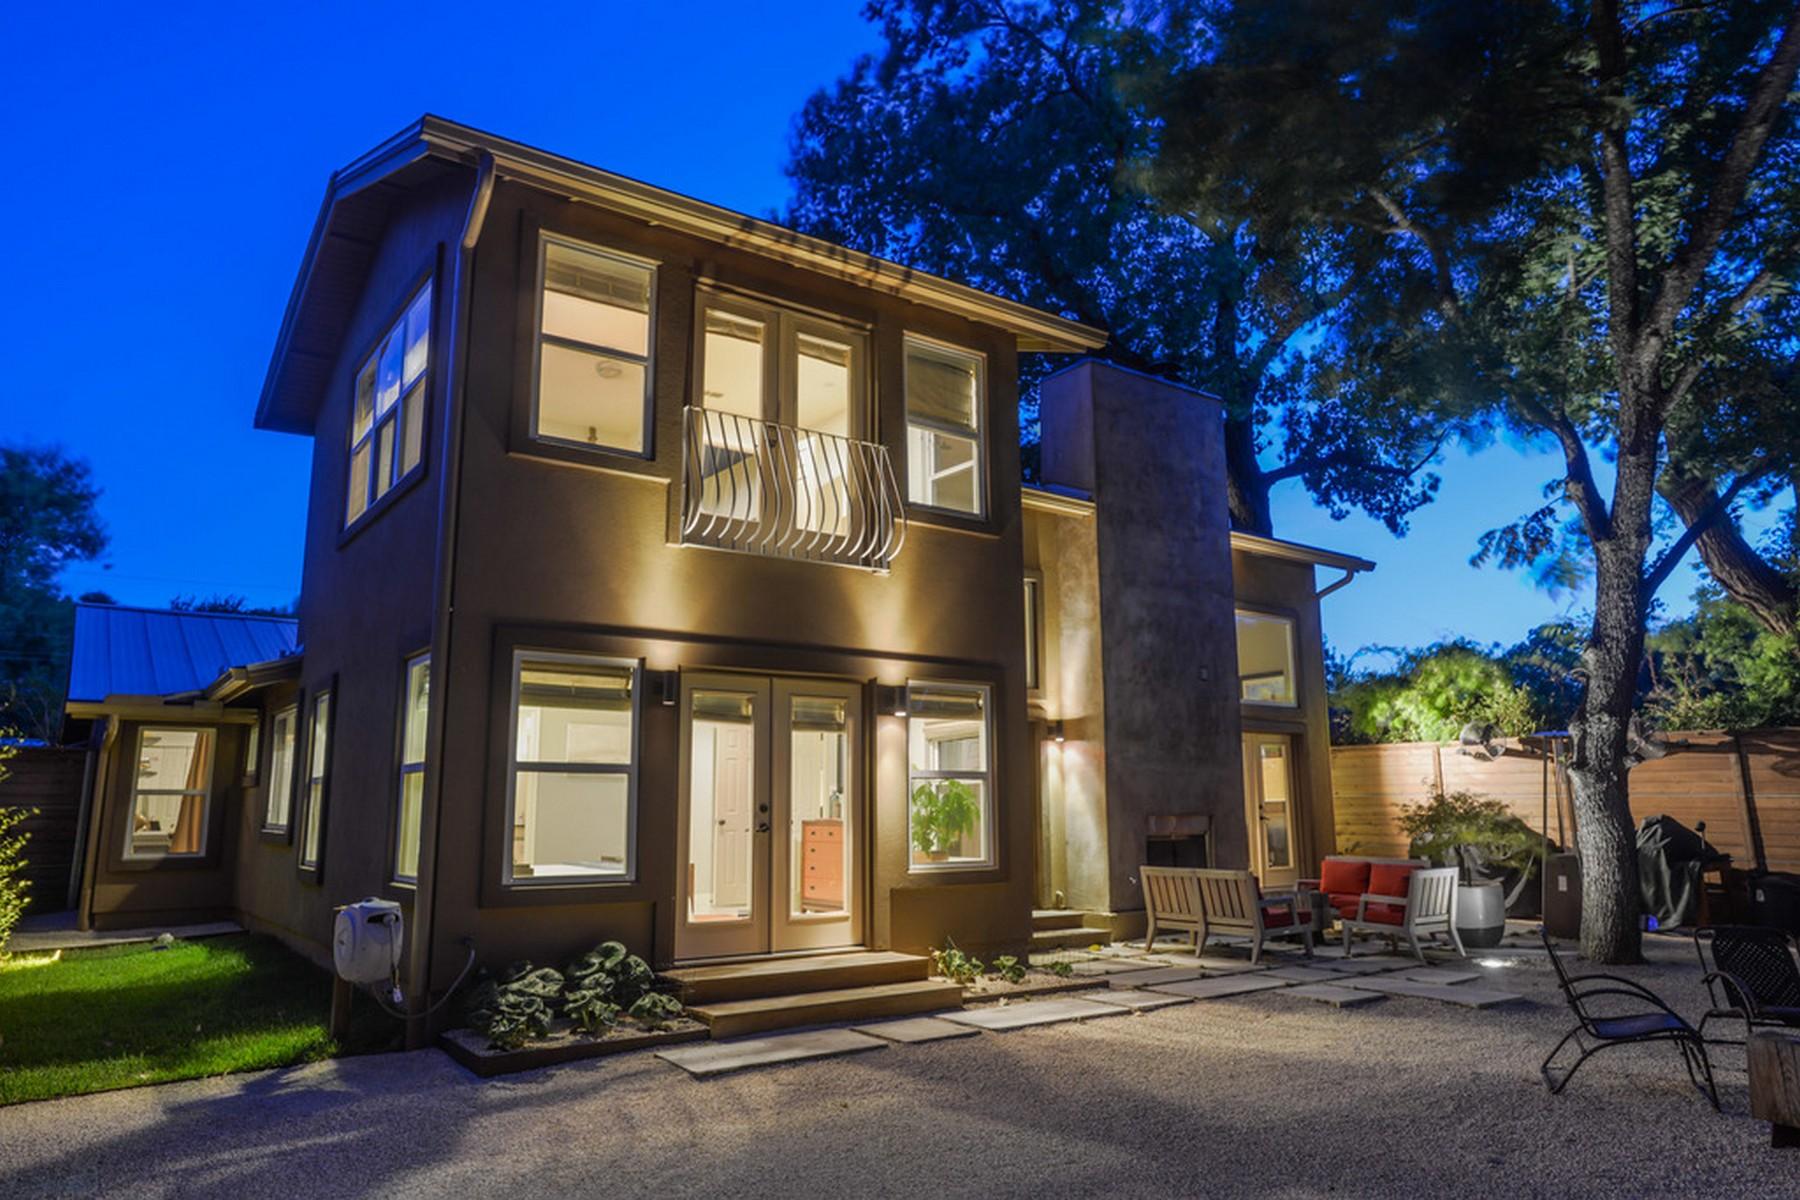 Nhà ở một gia đình vì Bán tại Contemporary Design Home in Zilker Park 1820 Spillman St Austin, Texas 78704 Hoa Kỳ